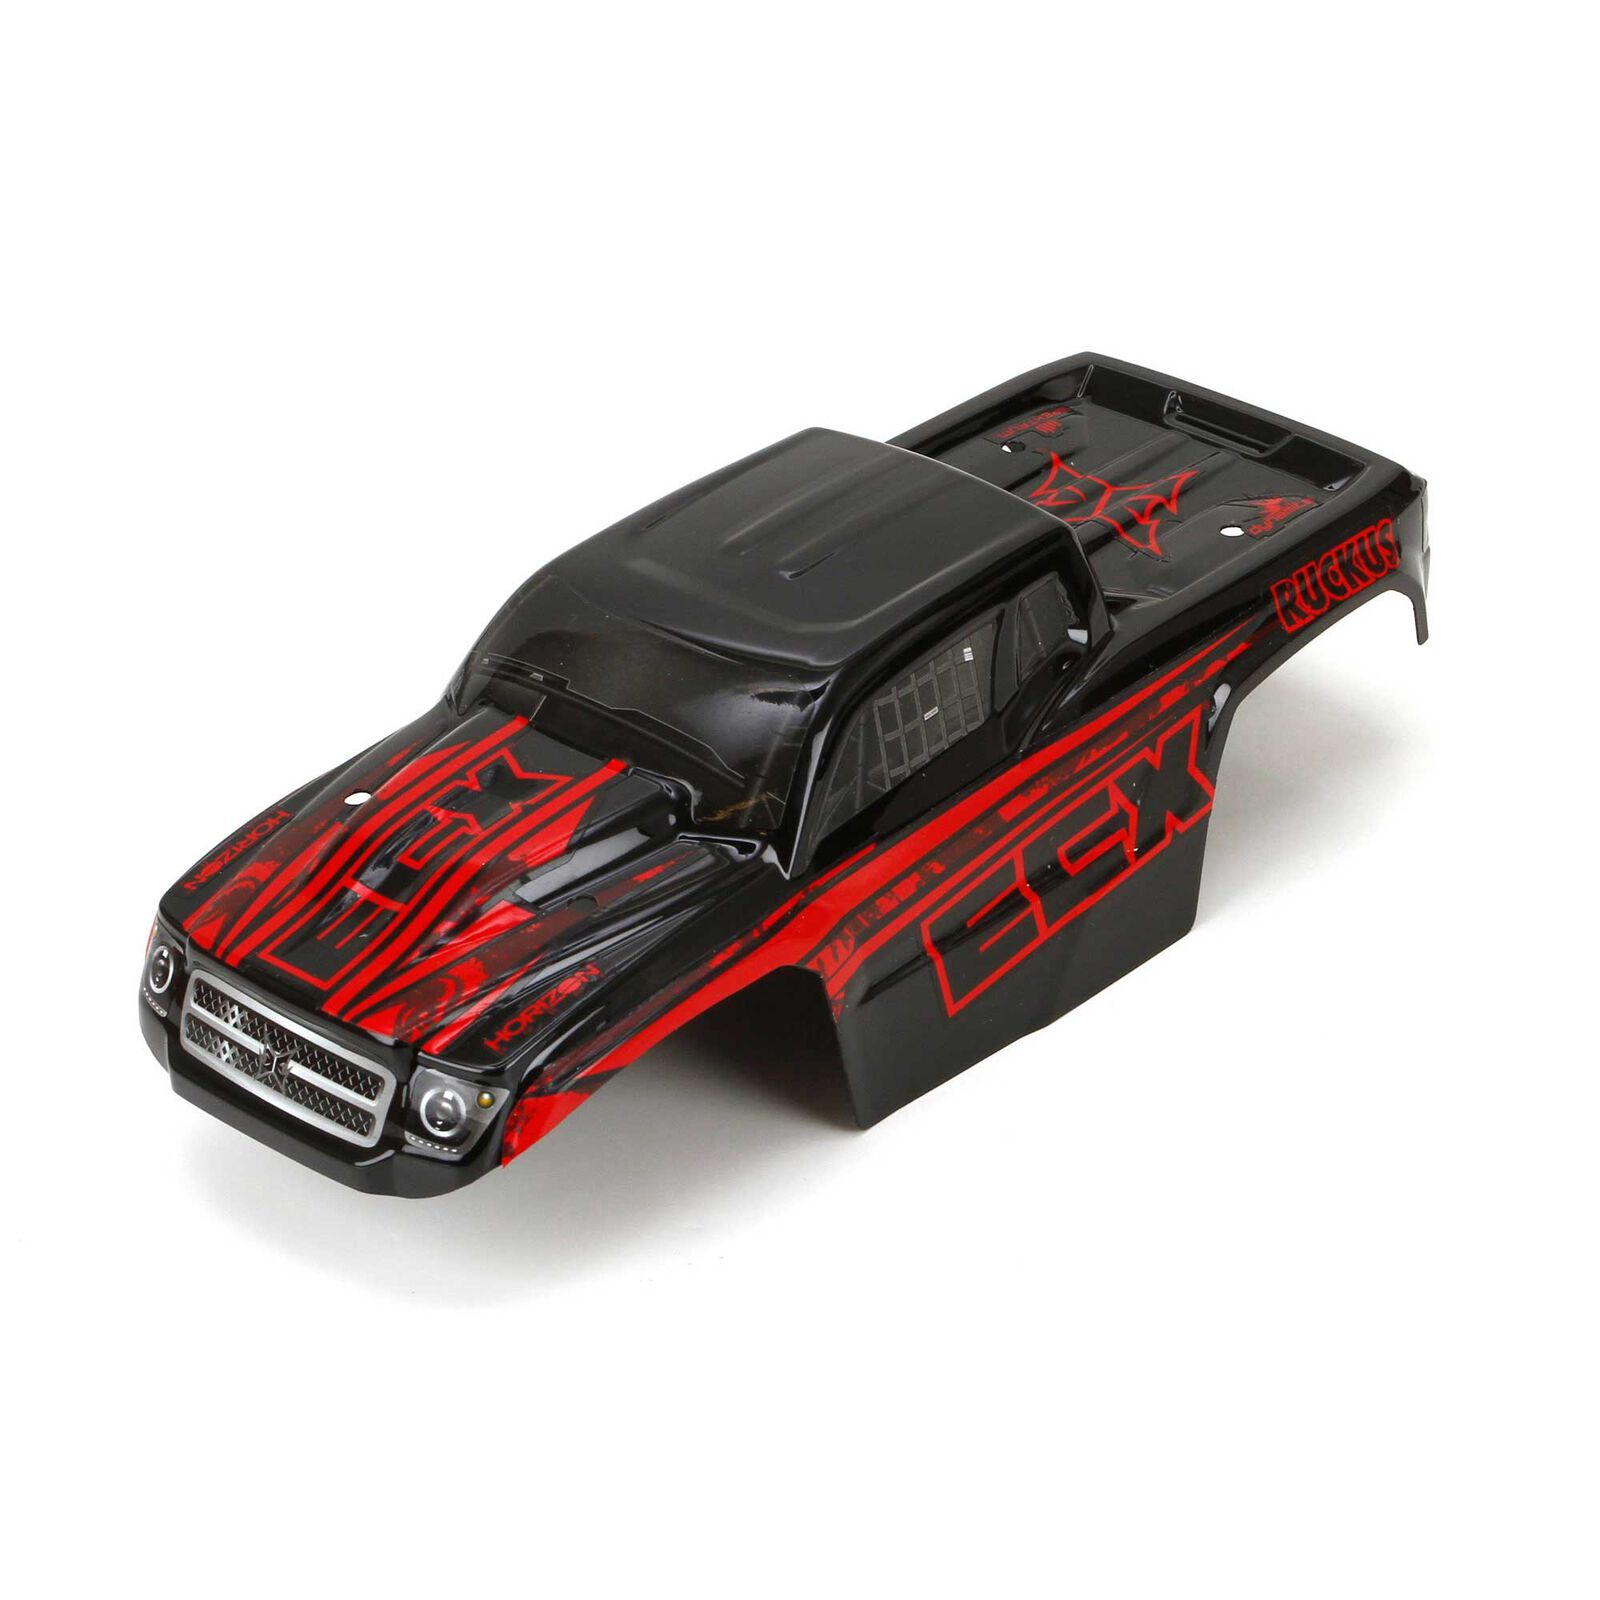 Body Set, Painted: 1/18 4WD Ruckus